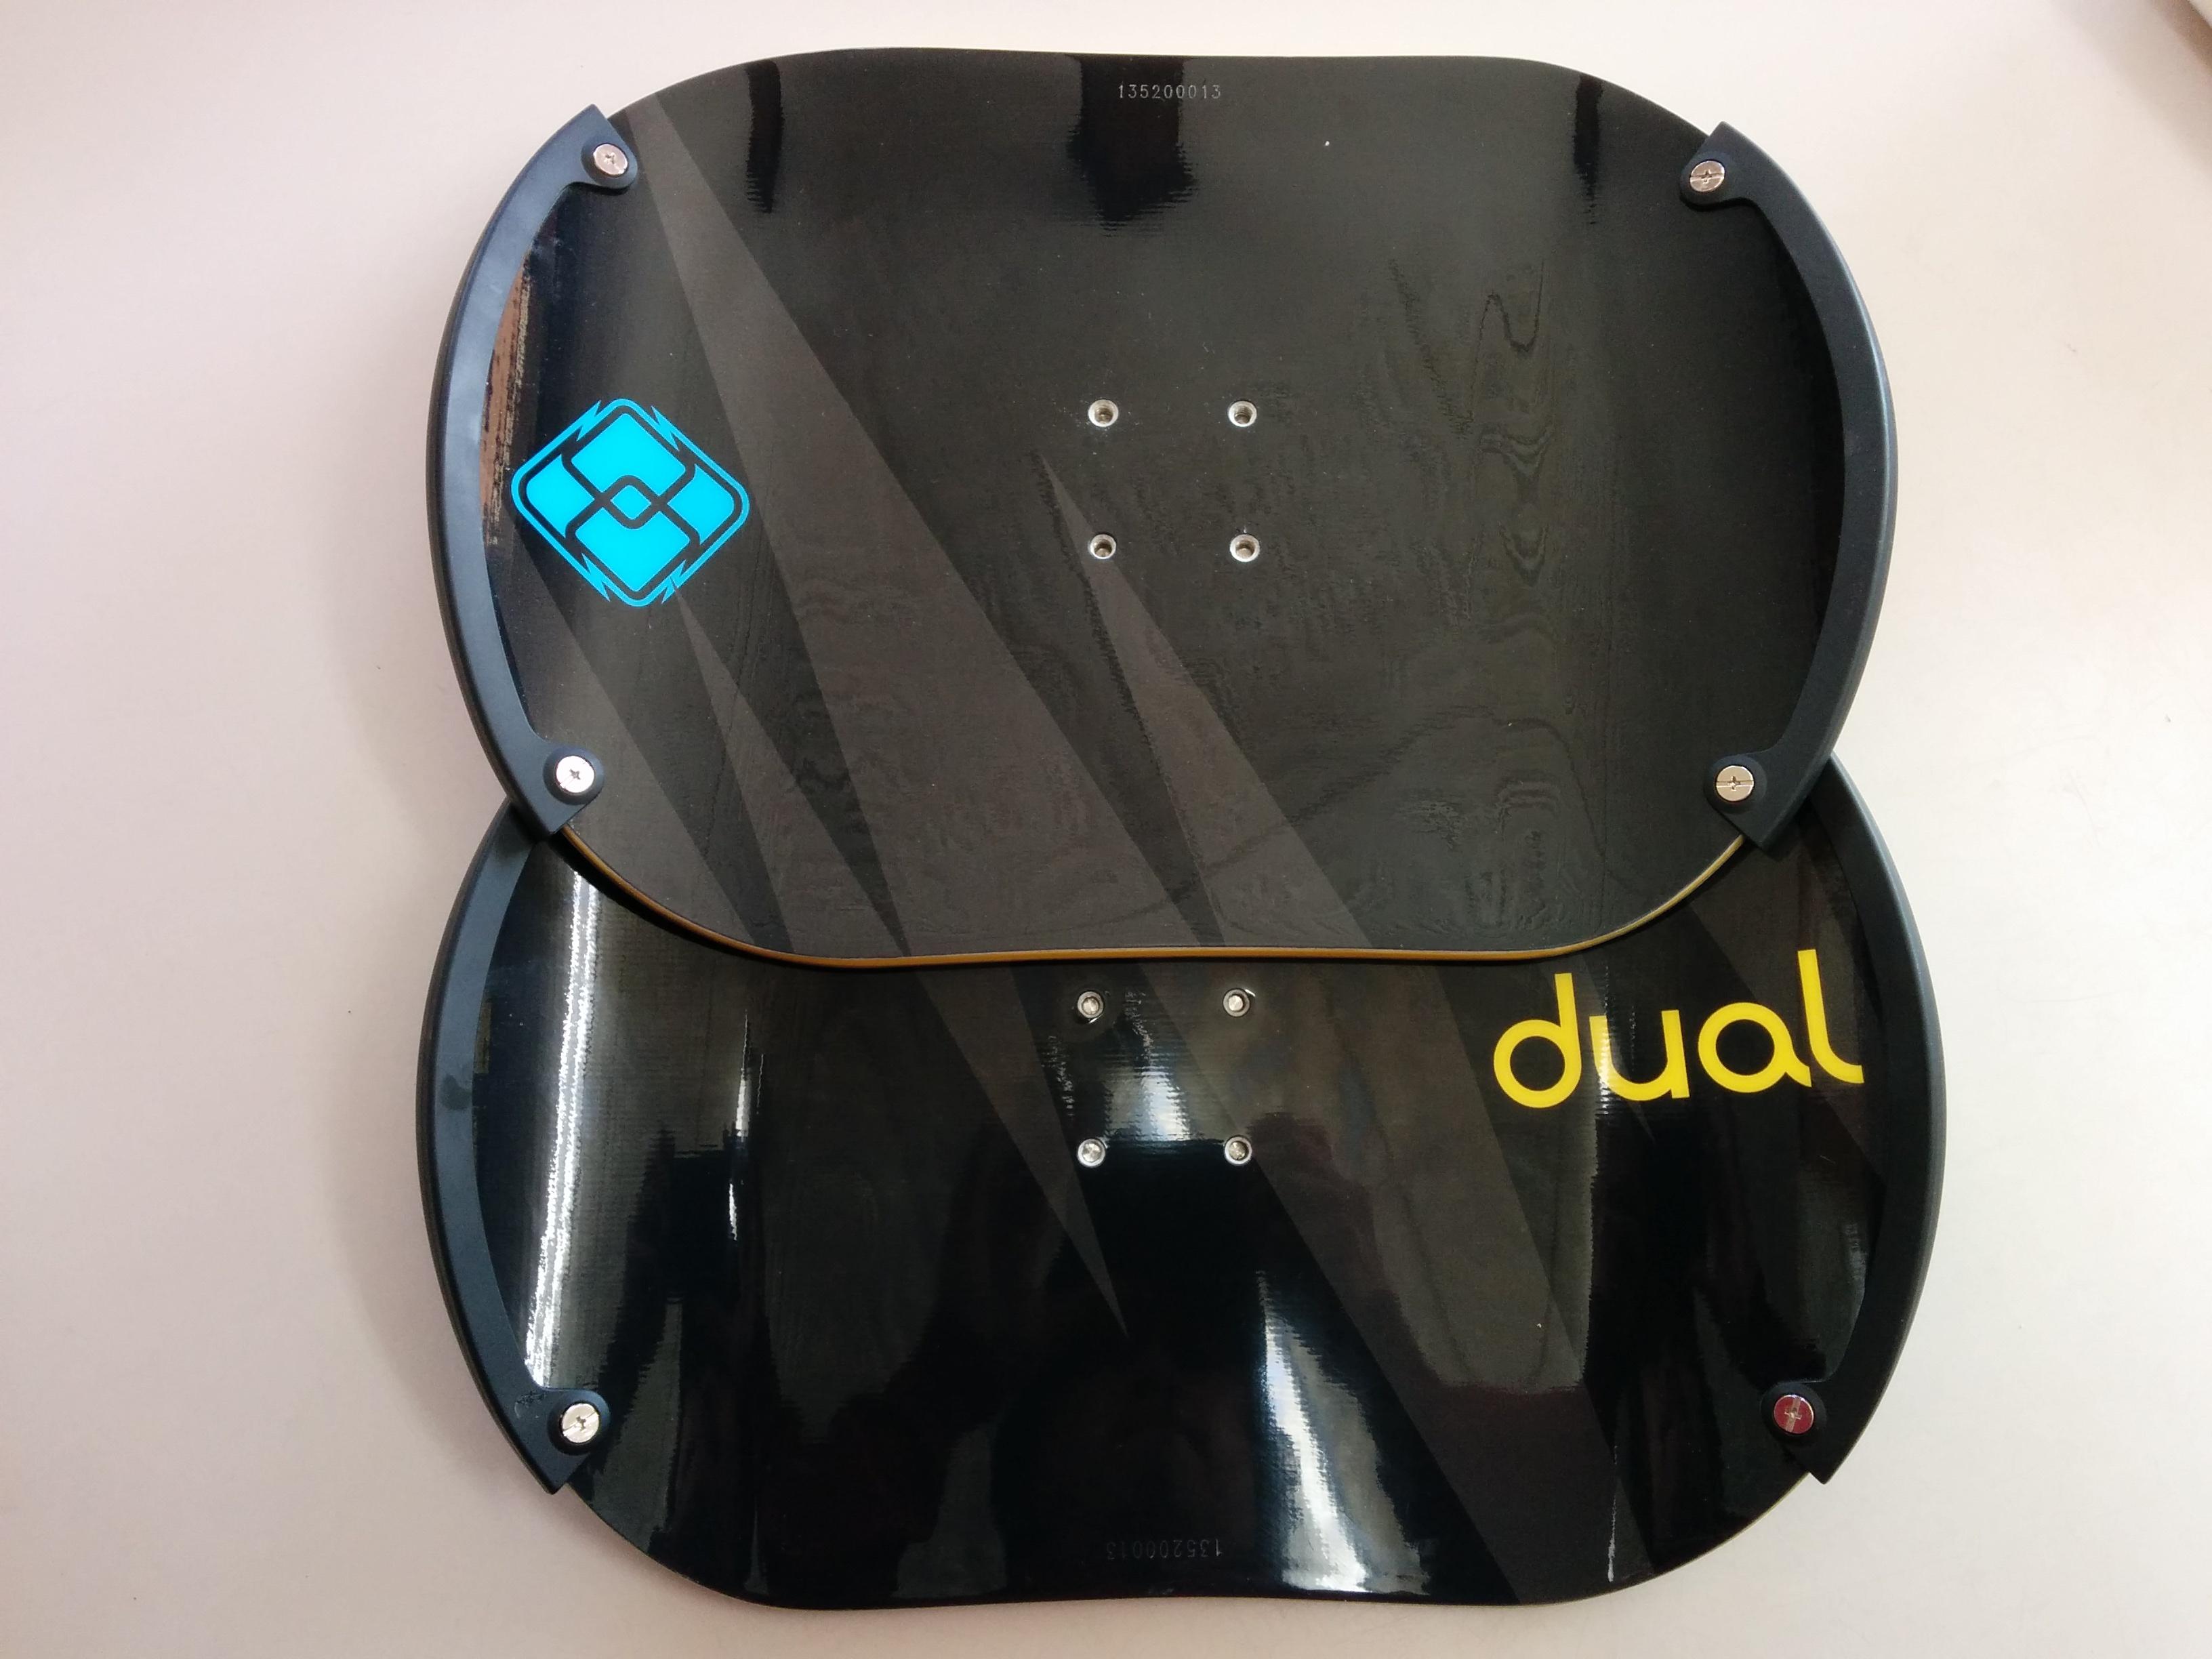 dual_splinter